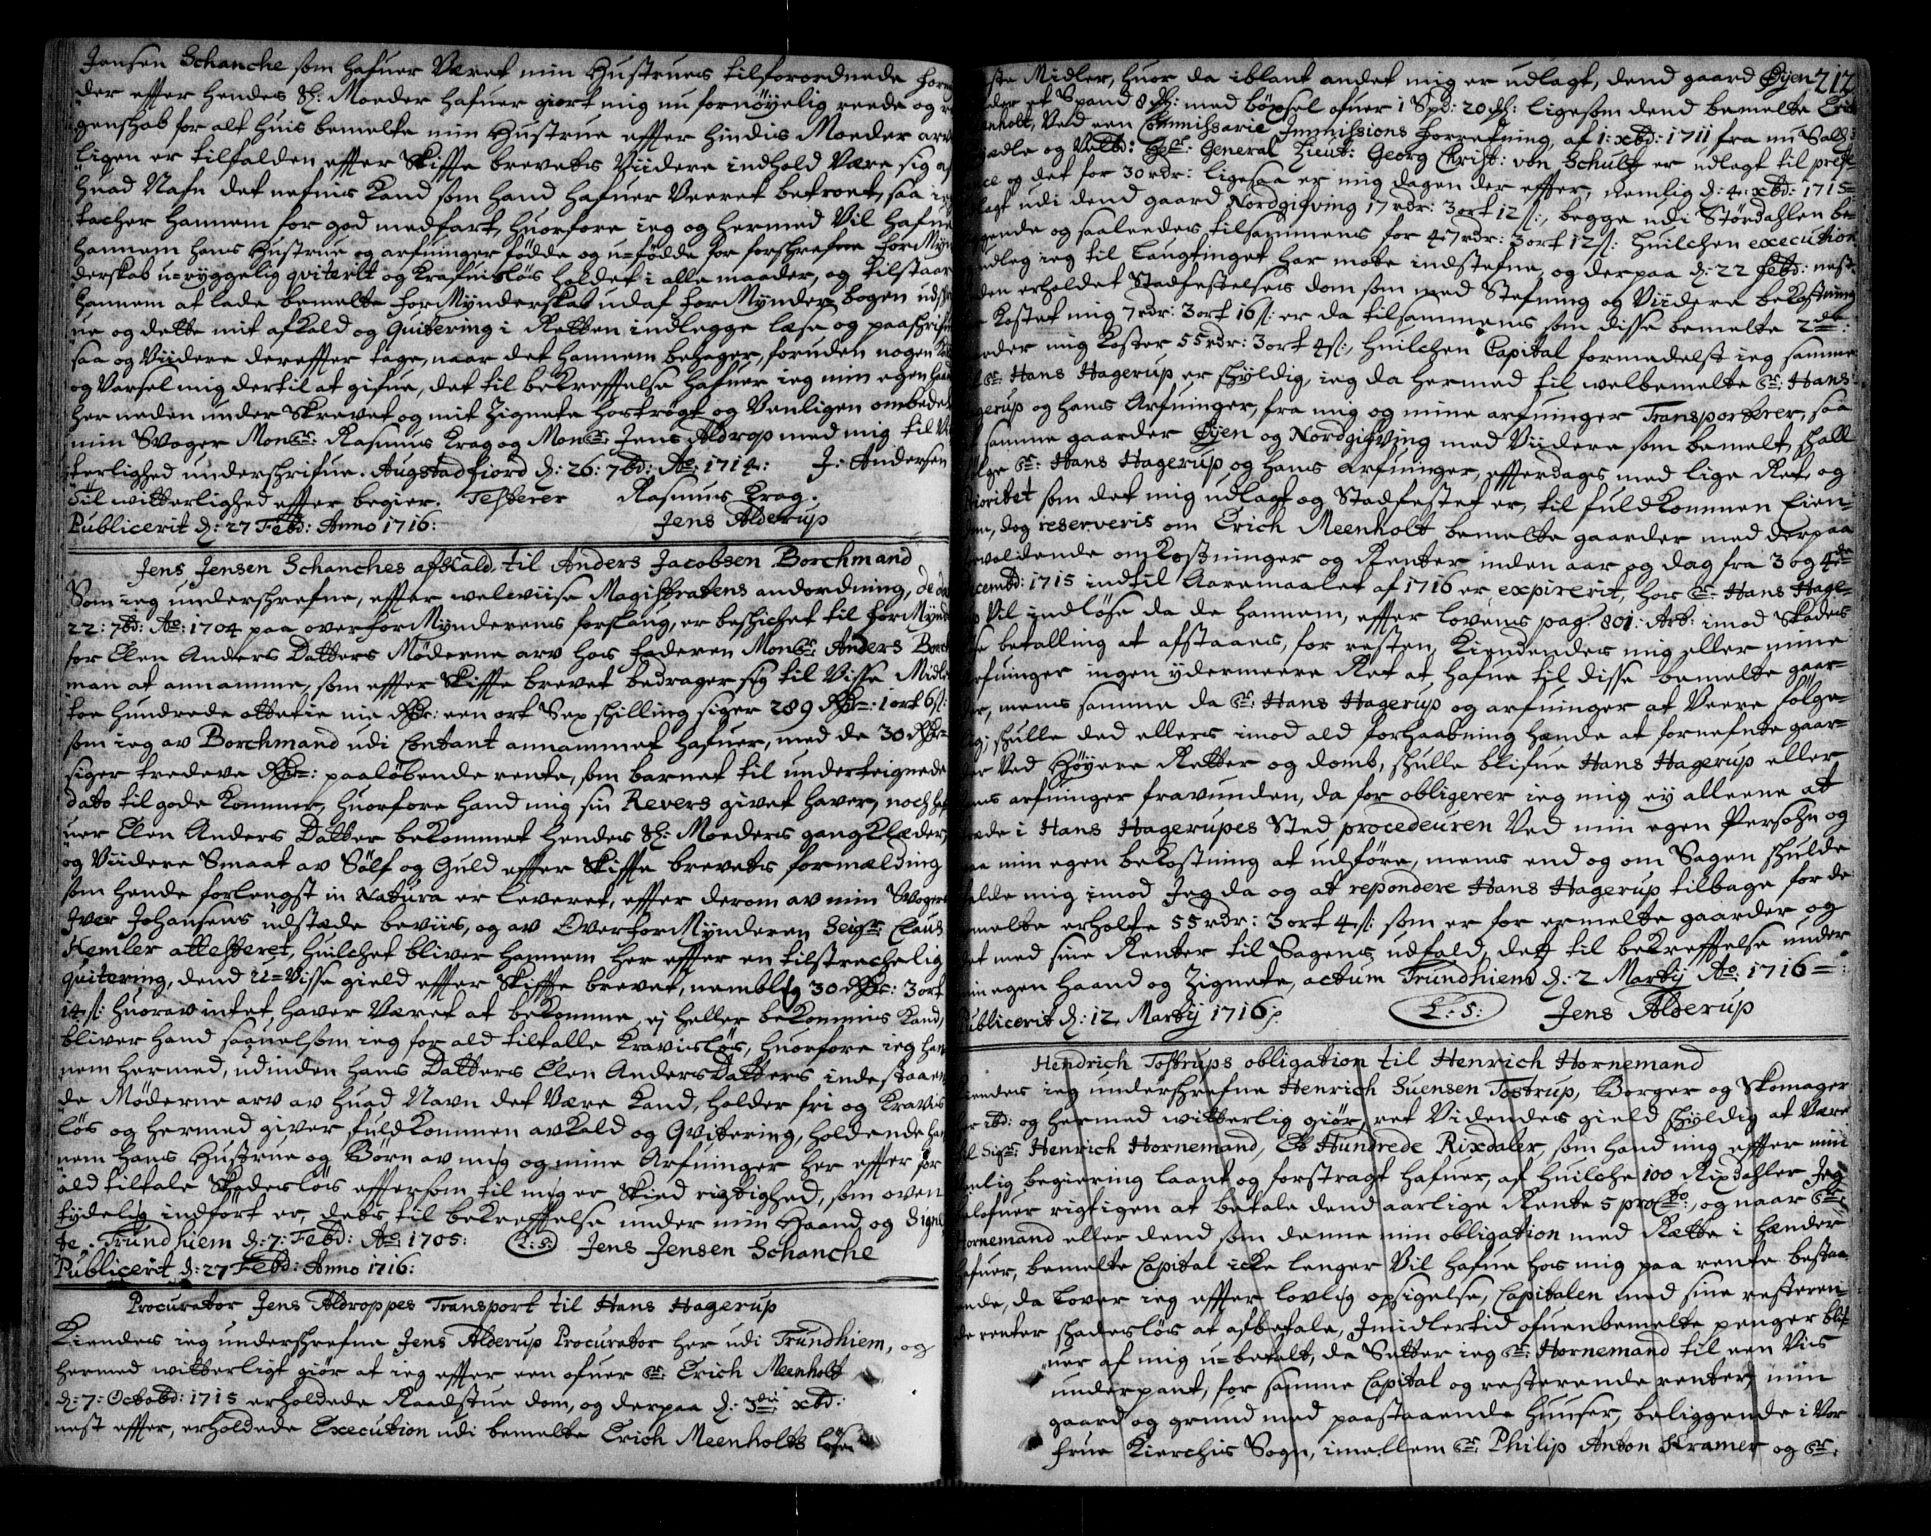 SAT, Trondheim byfogd, 2/2C/L0005: Mortgage book no. 3, 1709-1720, p. 212